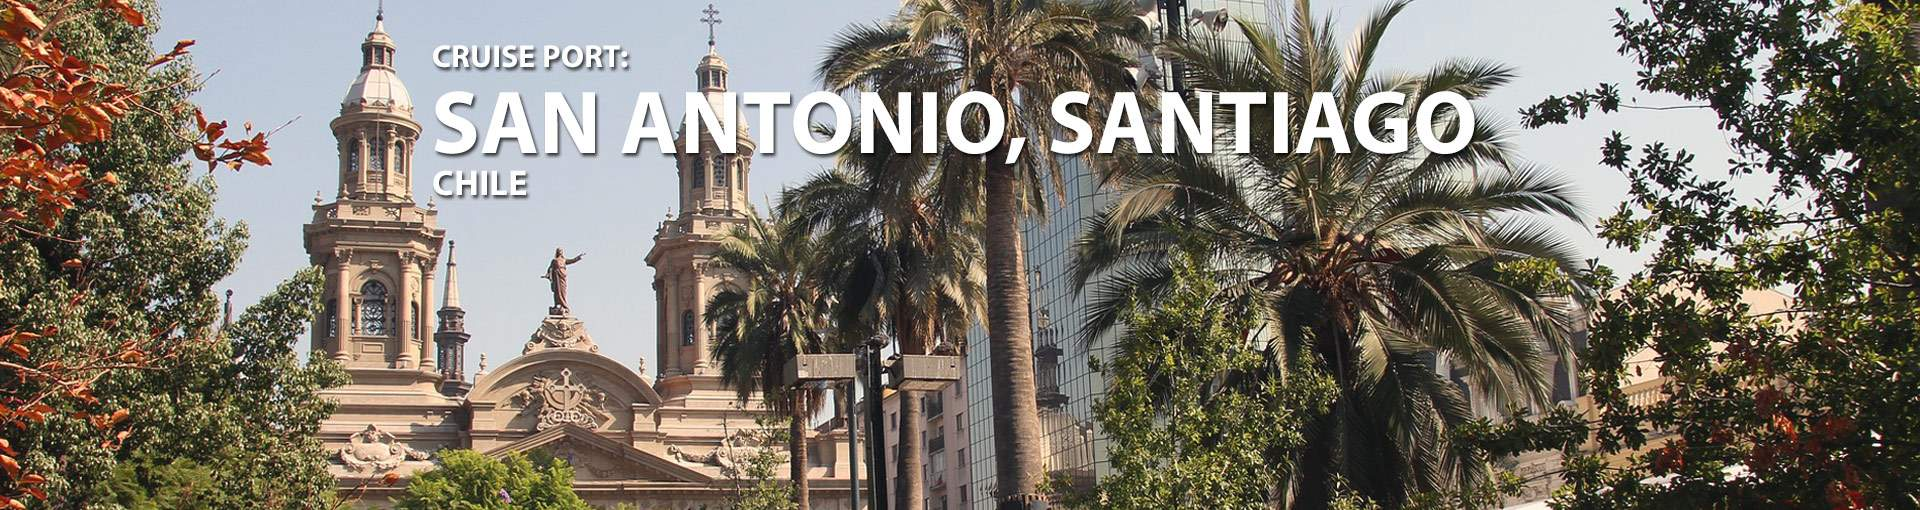 Banner for San Antonio, Santiago, Chile port